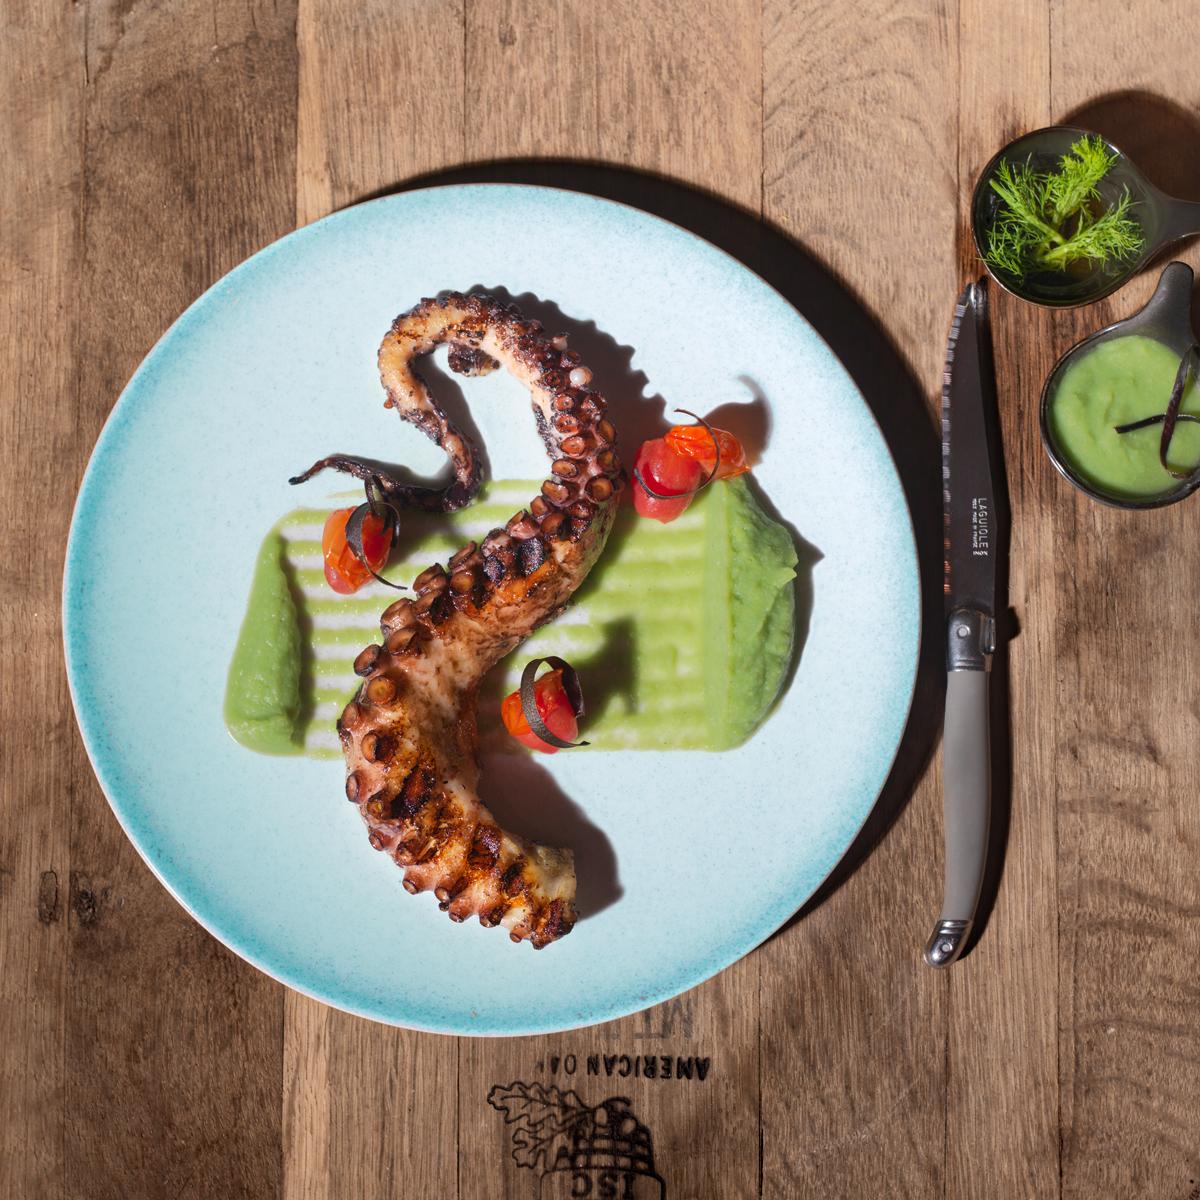 Octopus - Philema, Brussels